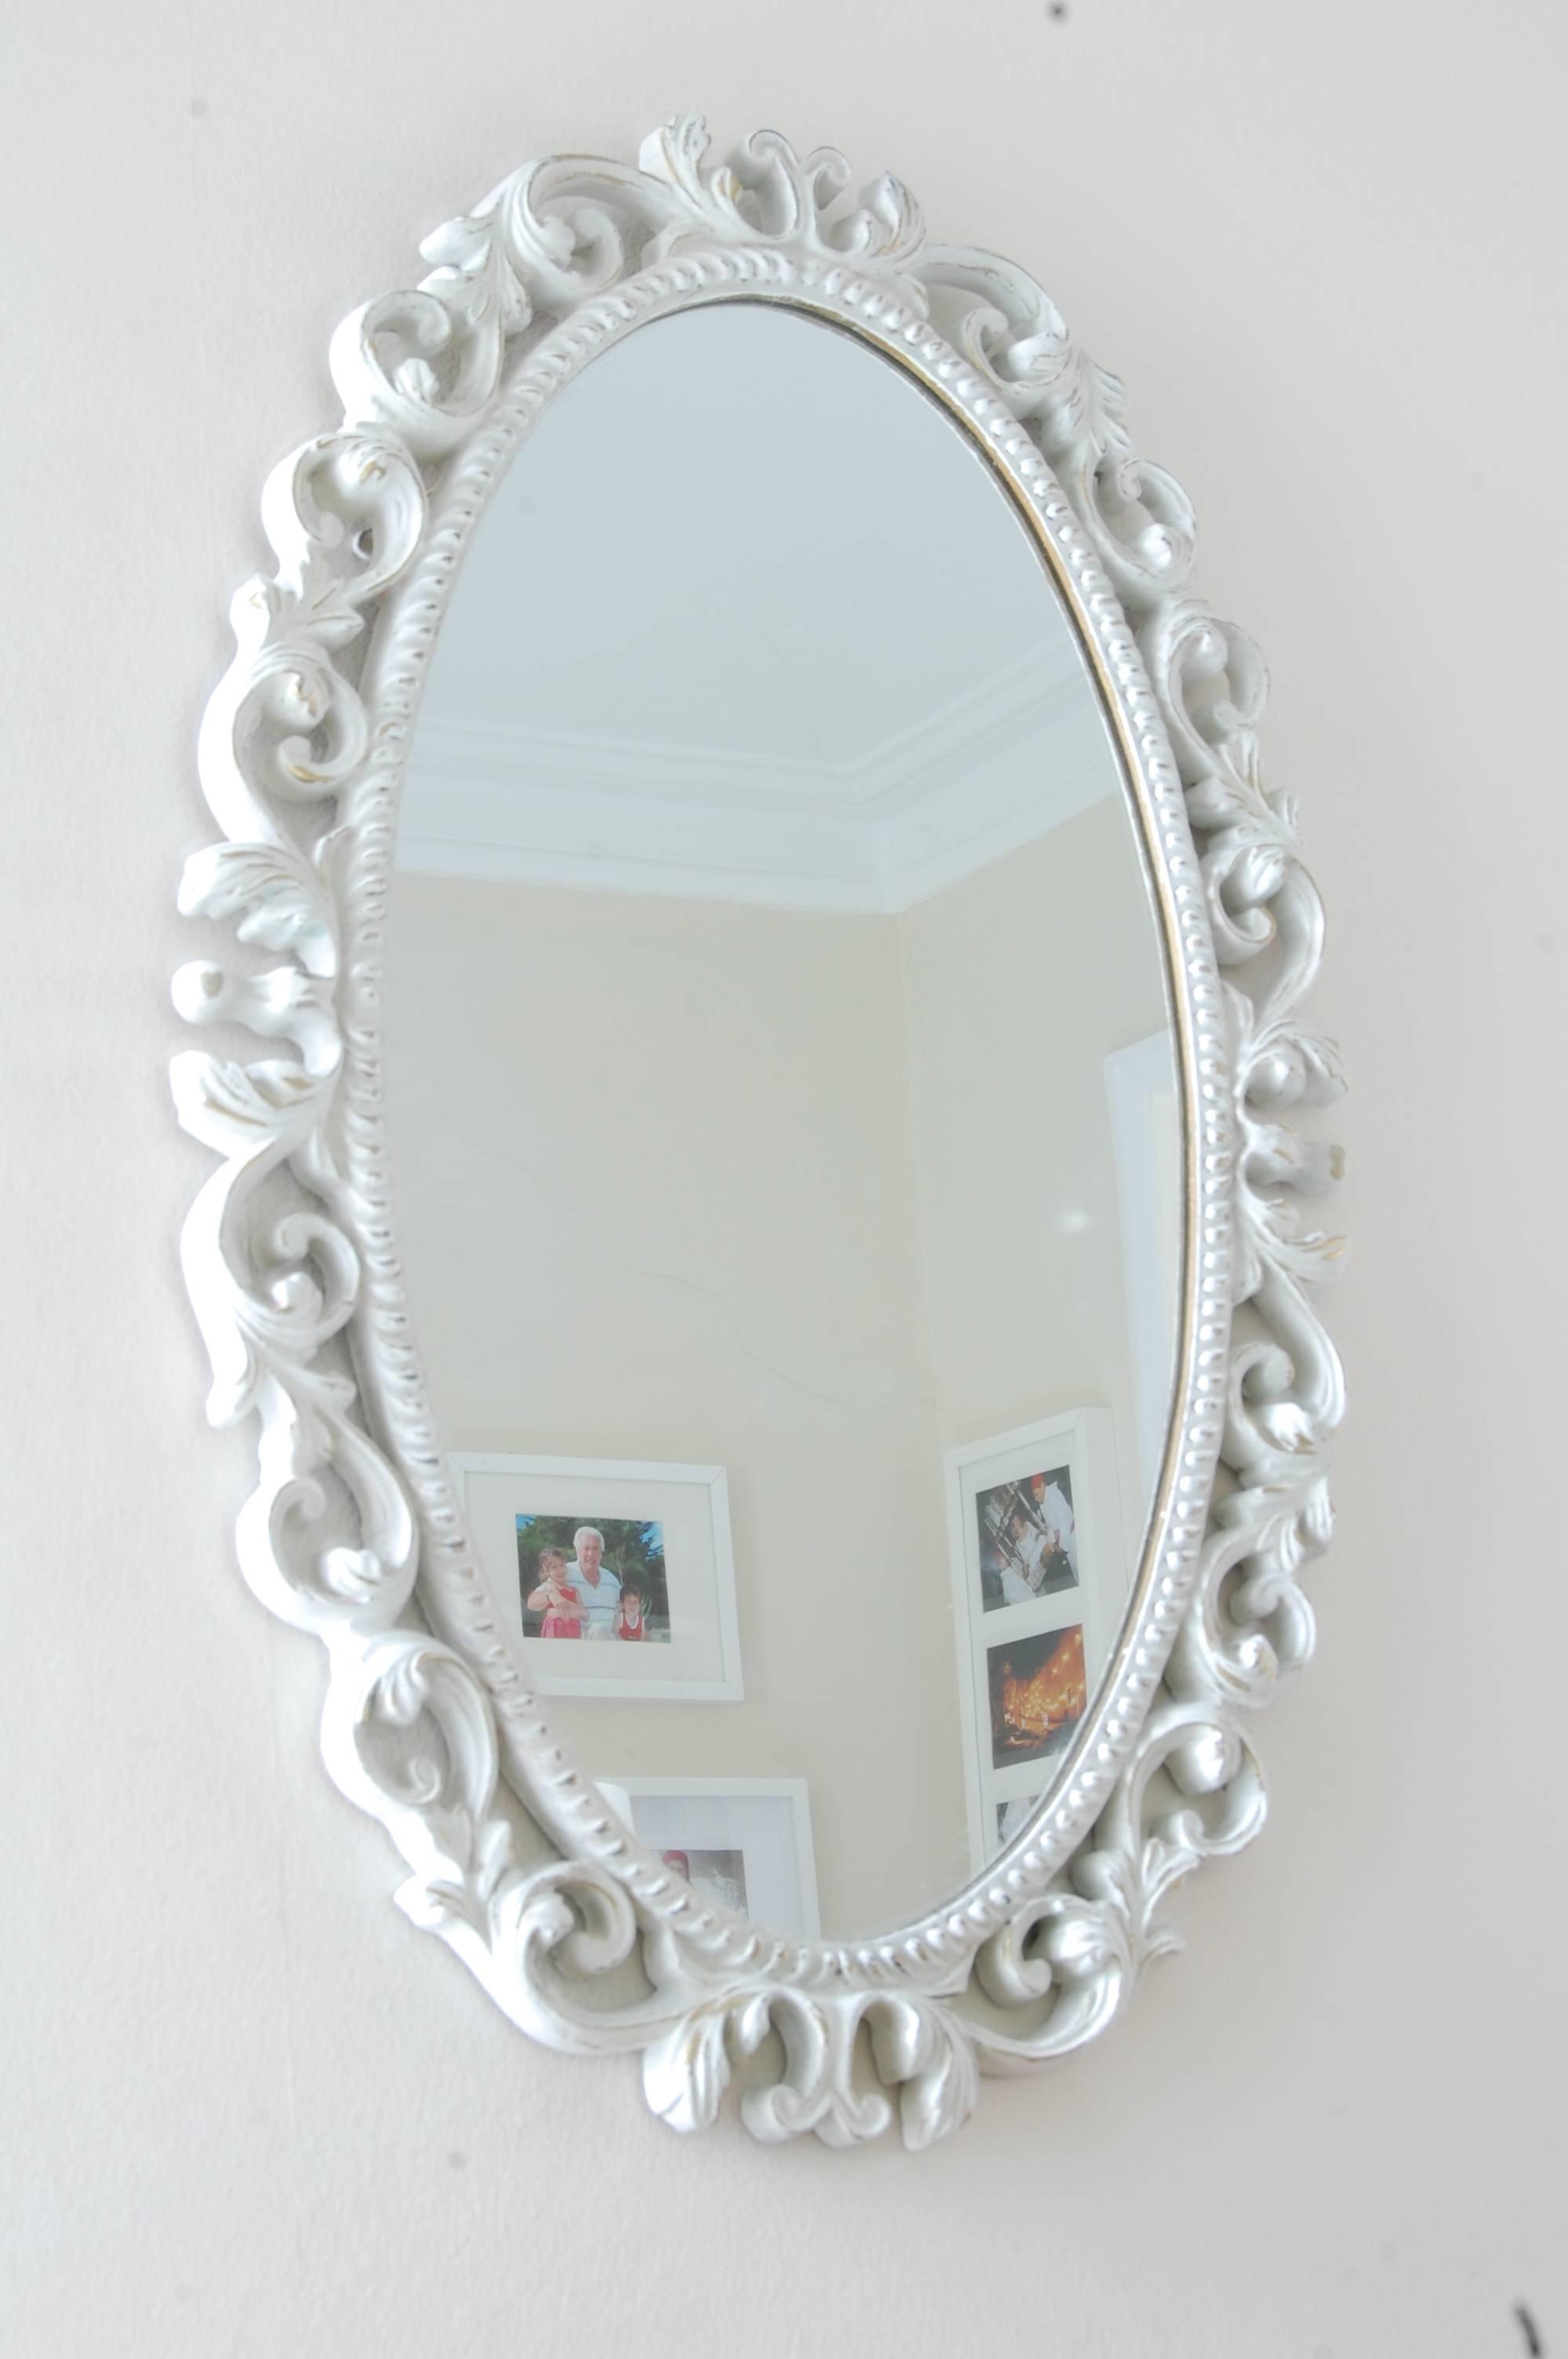 Antique Oval Mirror - Lovestruck Interiors regarding Antique White Oval Mirrors (Image 3 of 15)